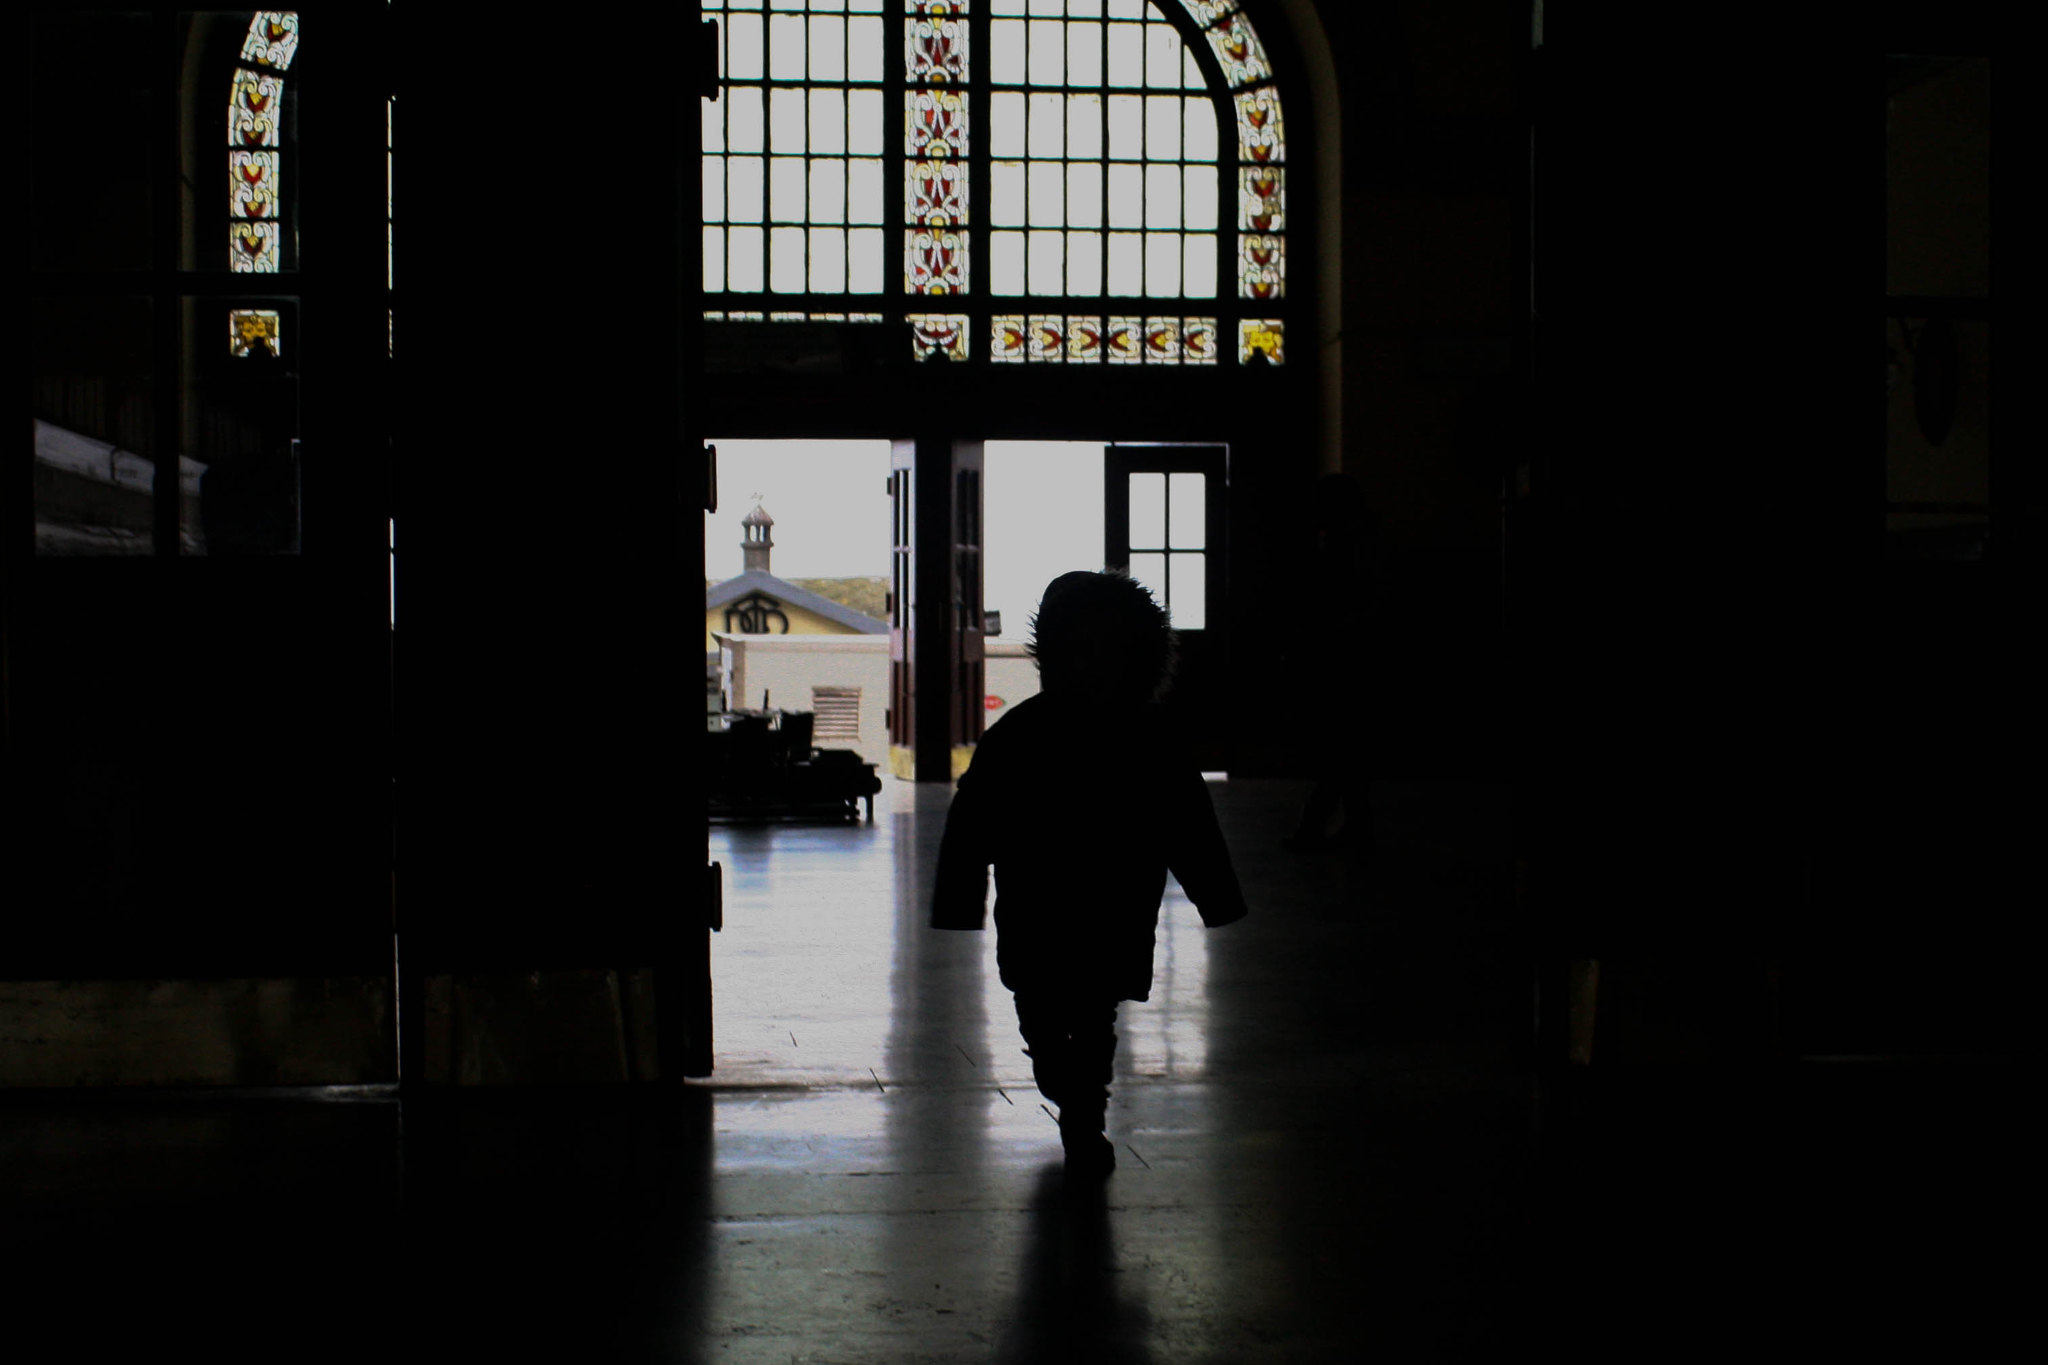 Running through Haydarpaşa Station